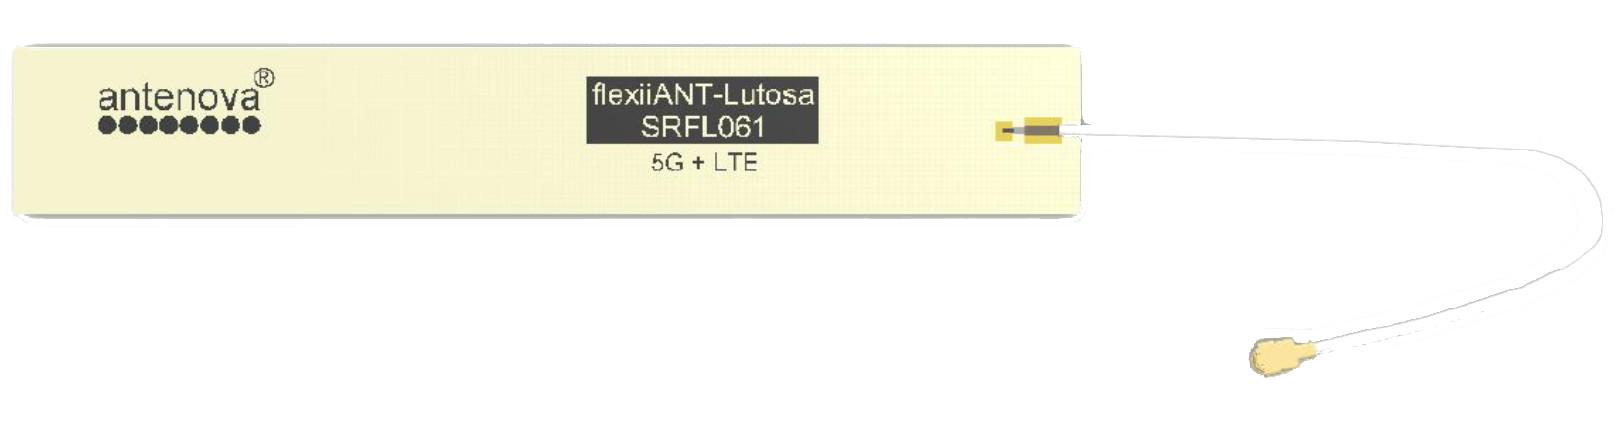 Antenne SRFL061 Lutosa